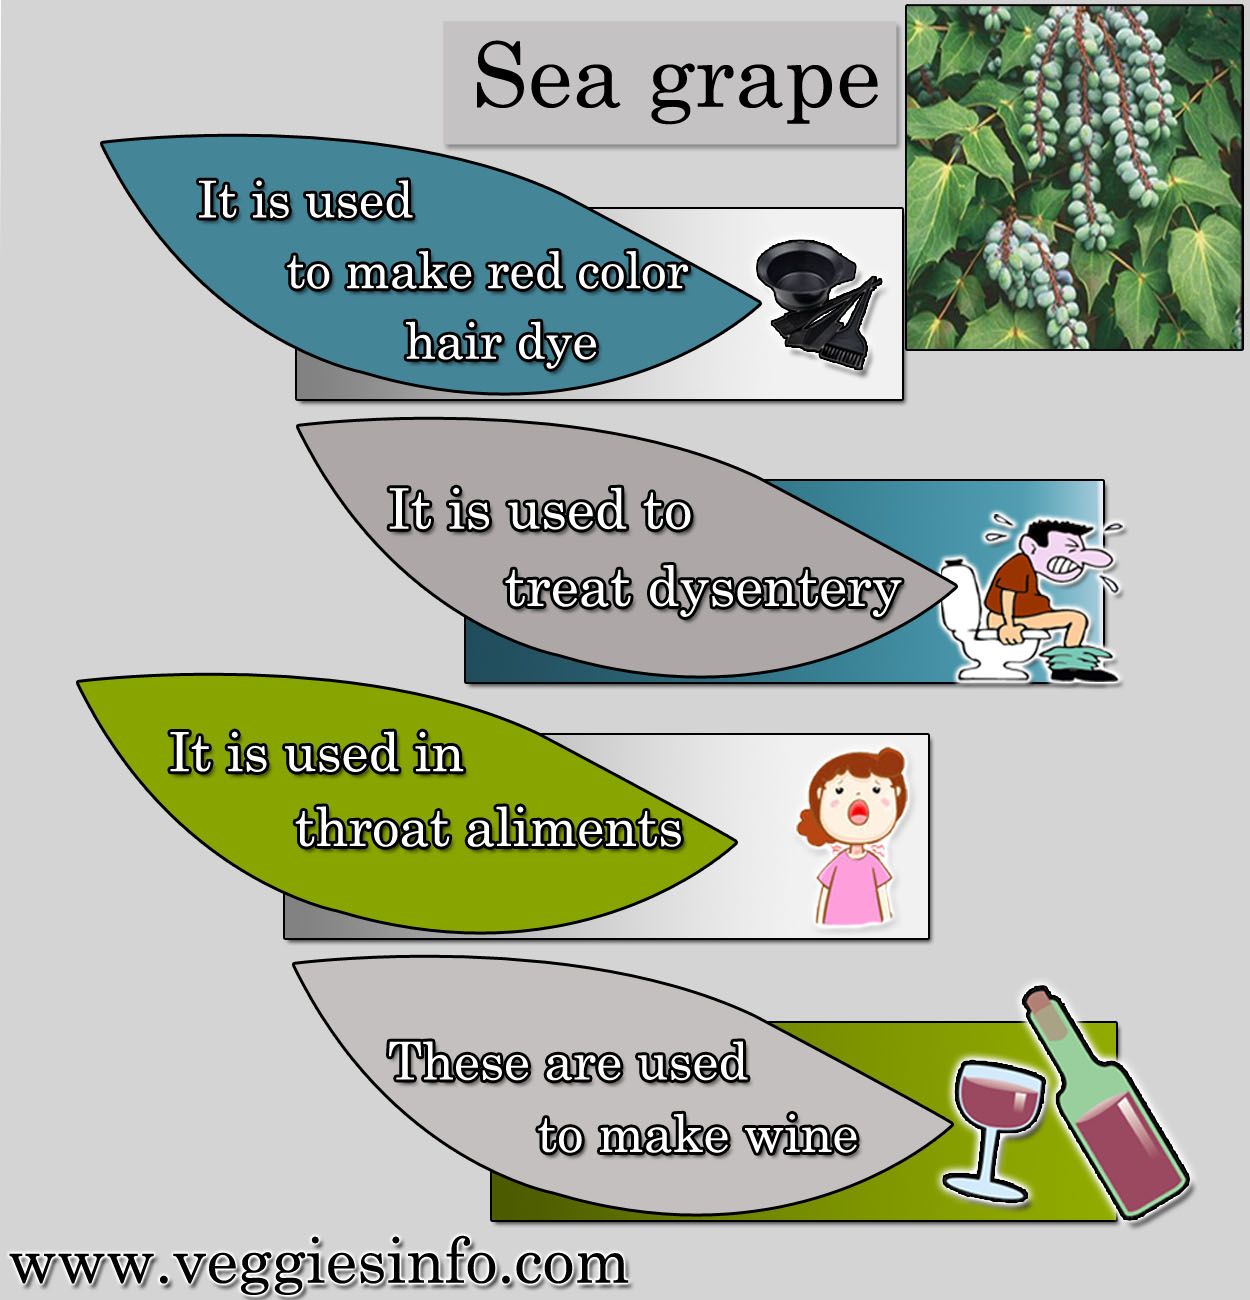 Health Benefits of Sea Grape